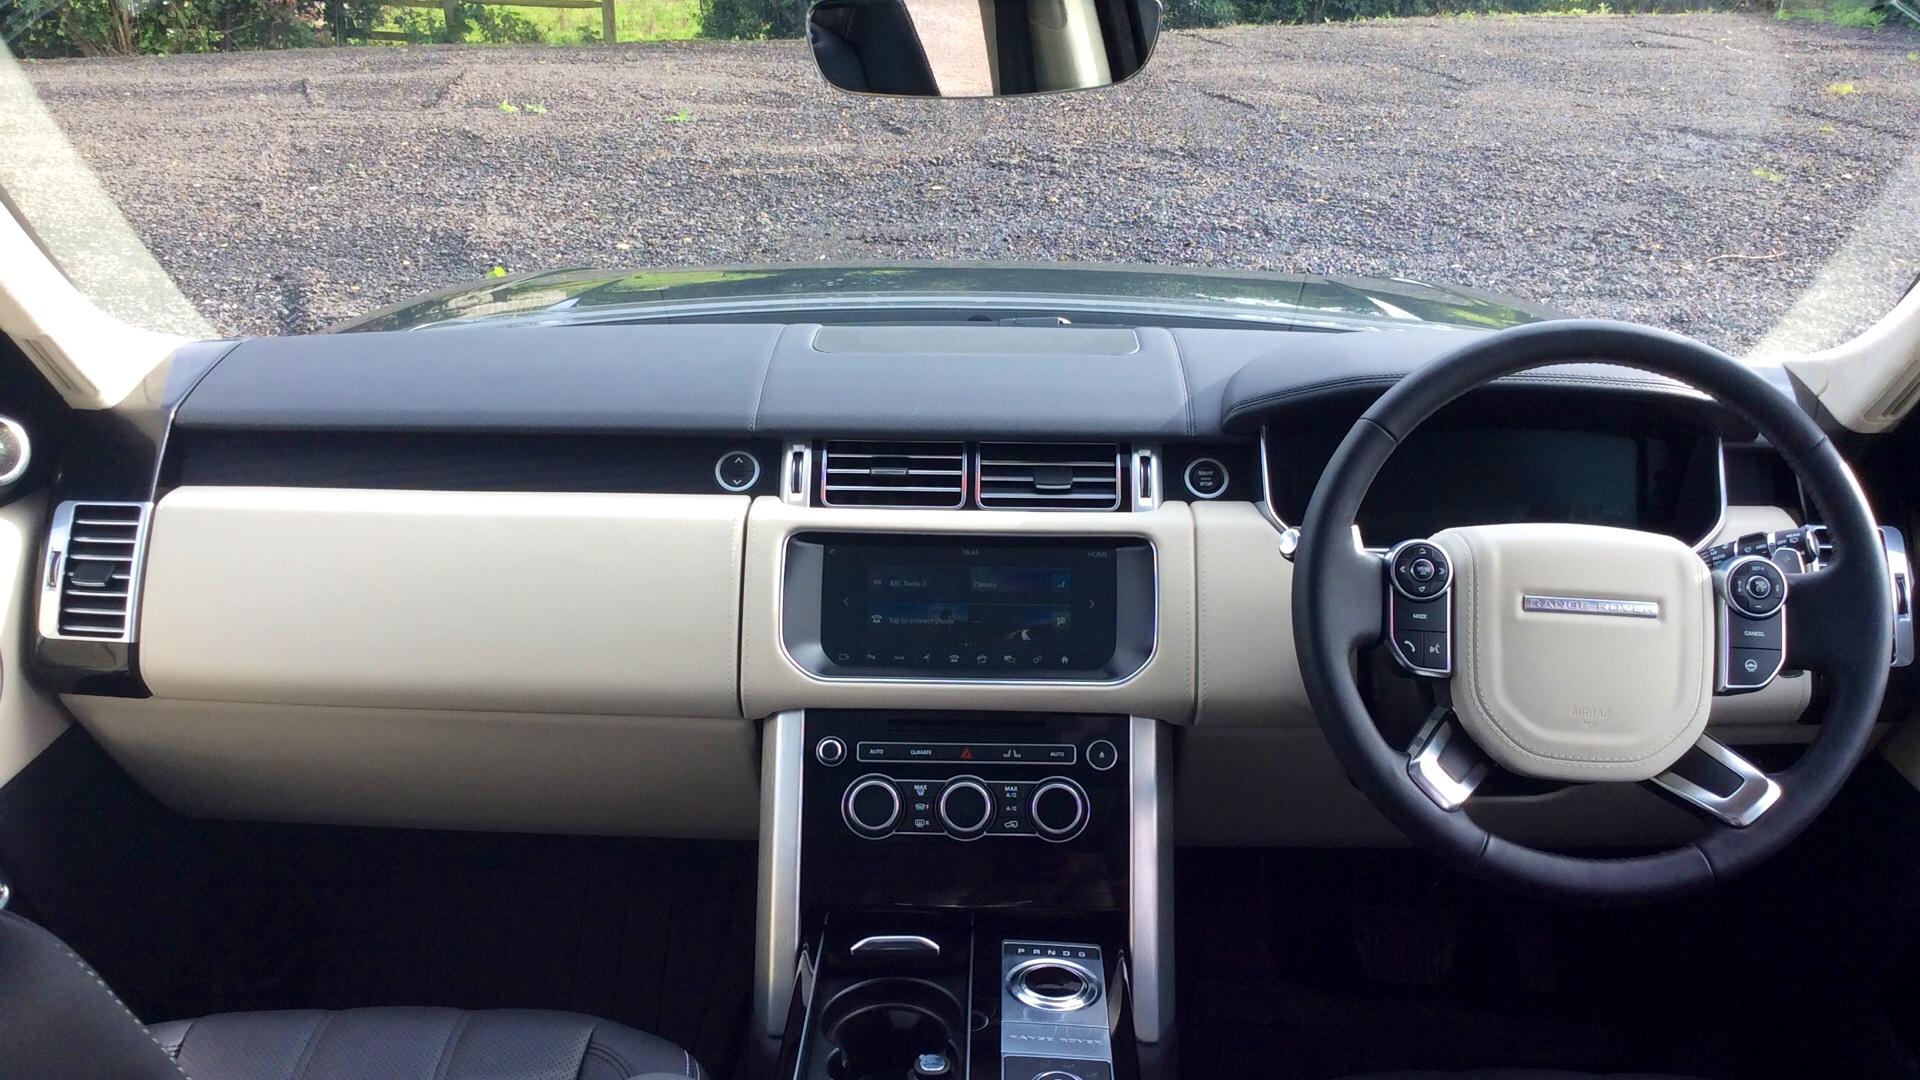 Used Land Rover Range Rover Autobiography SDV8 Grey YC17AXG